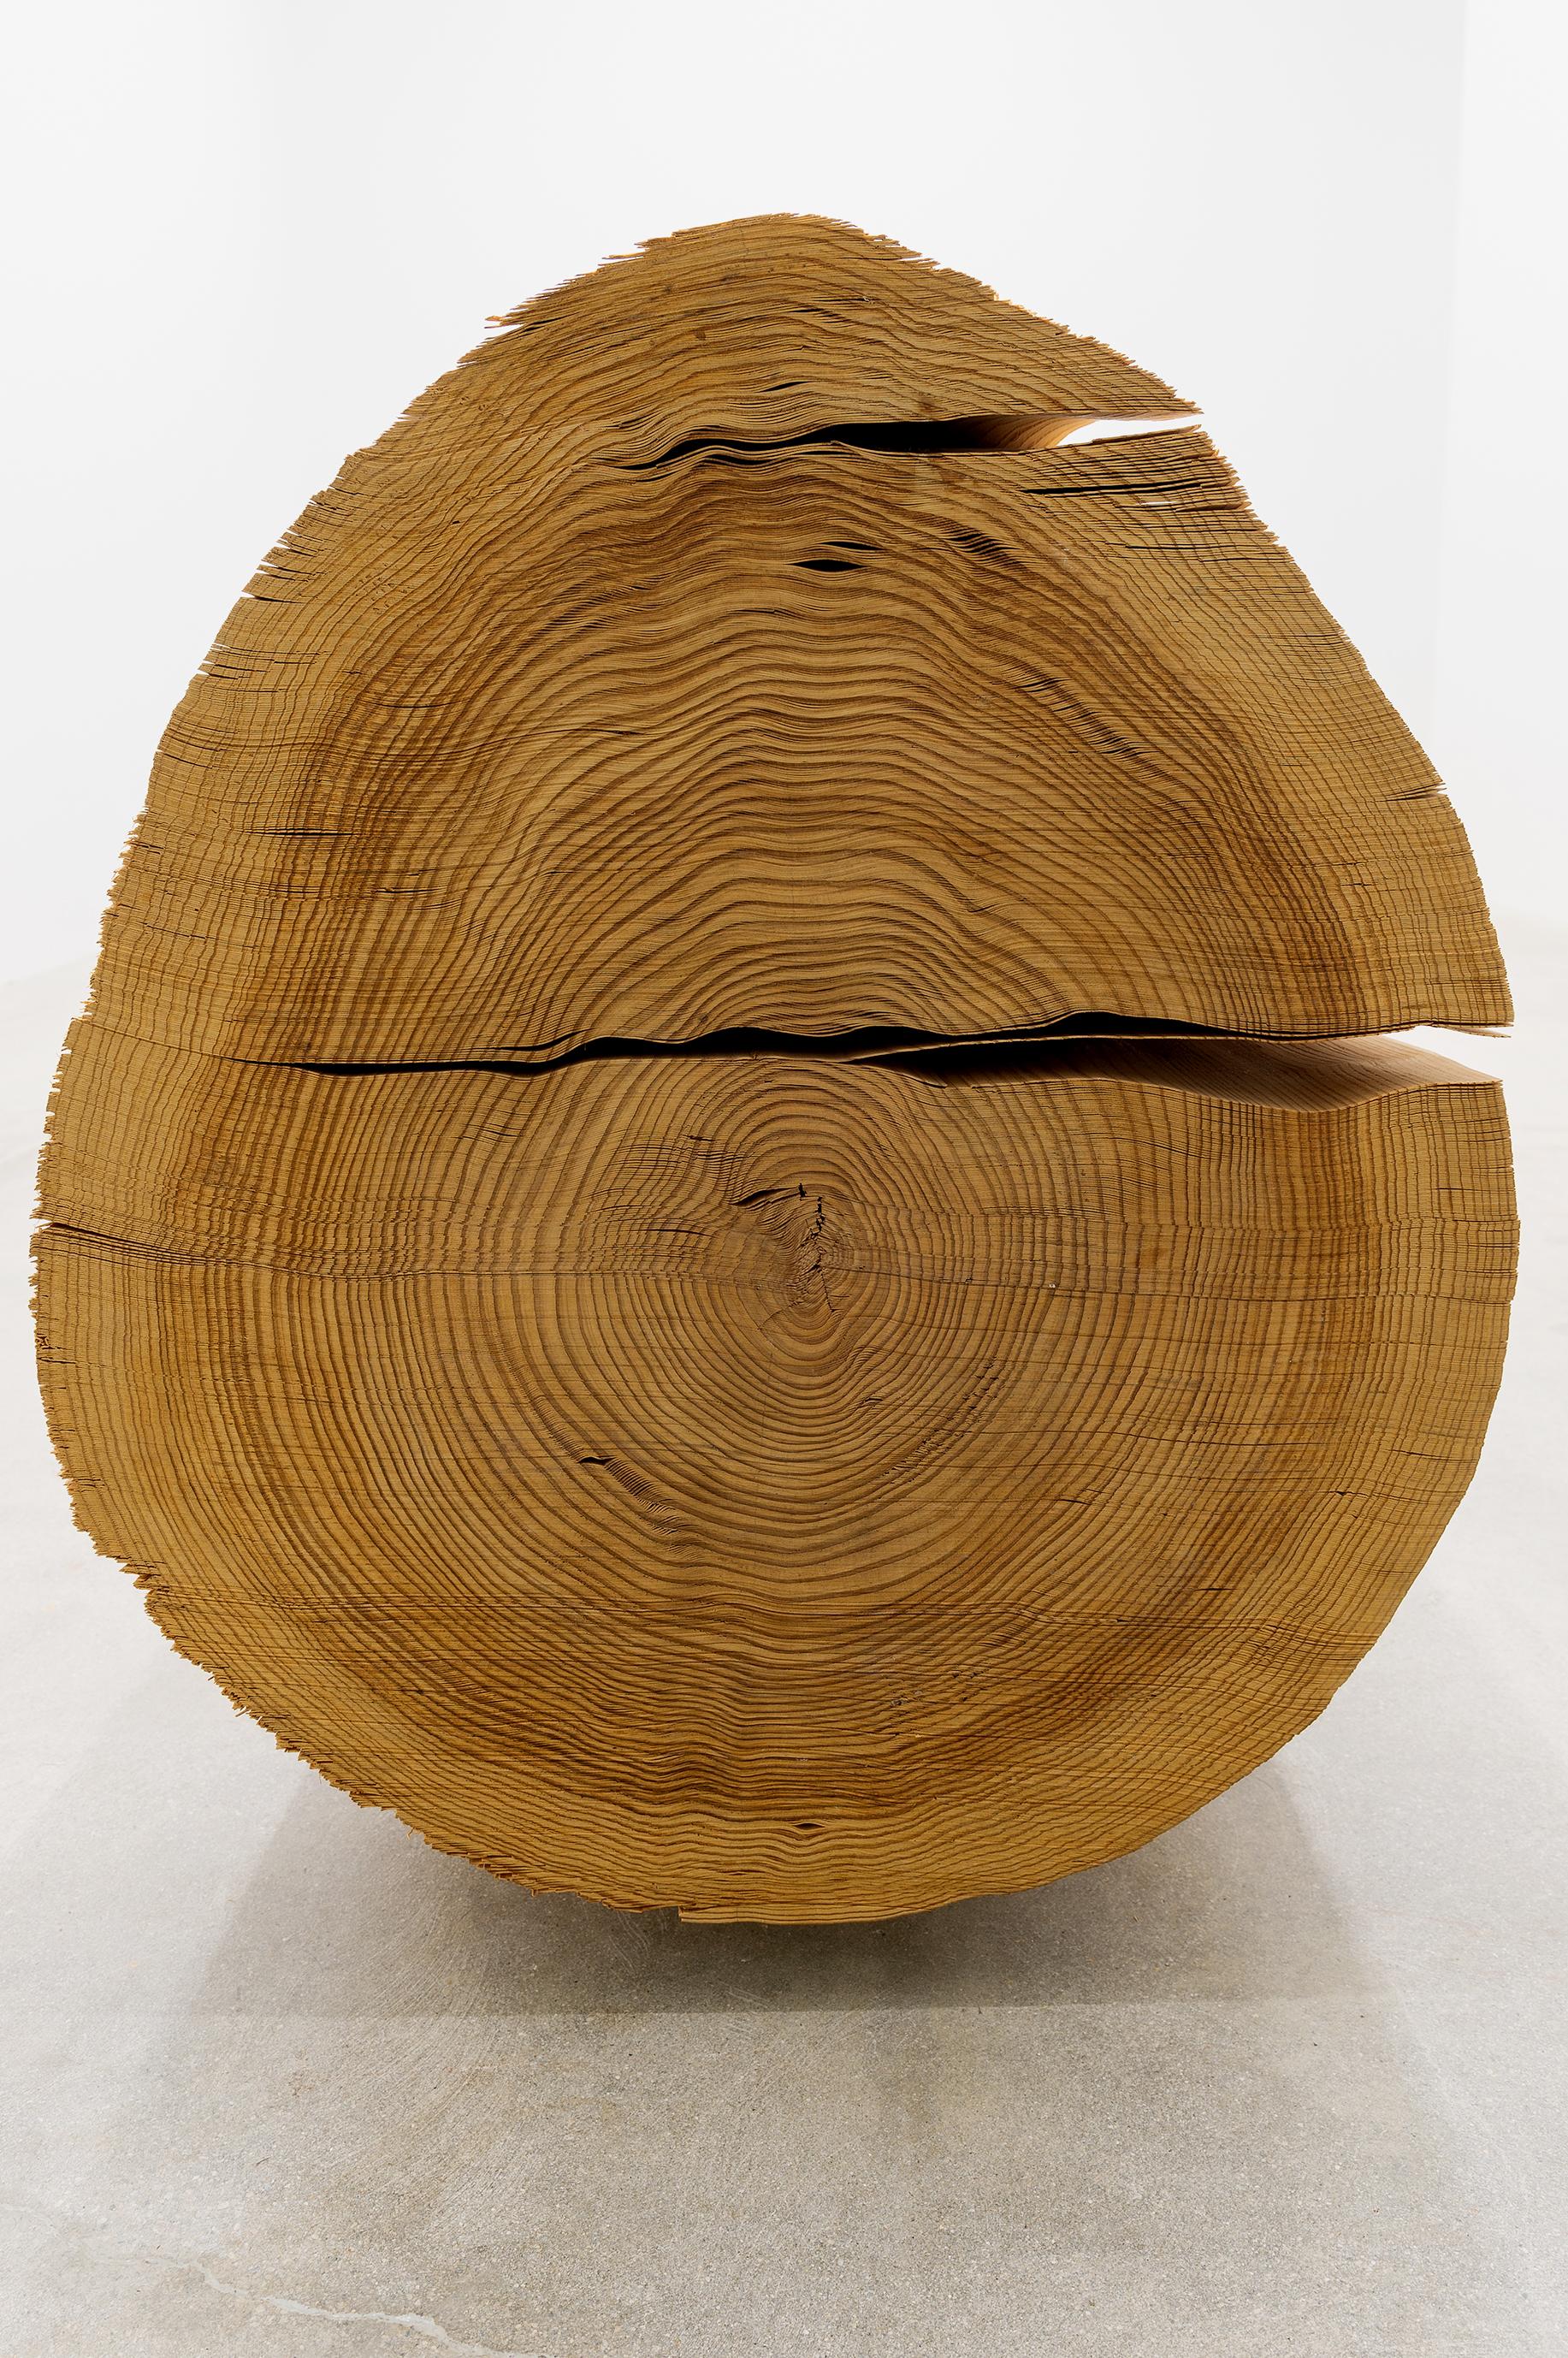 Wood No. 5 CI, 1984